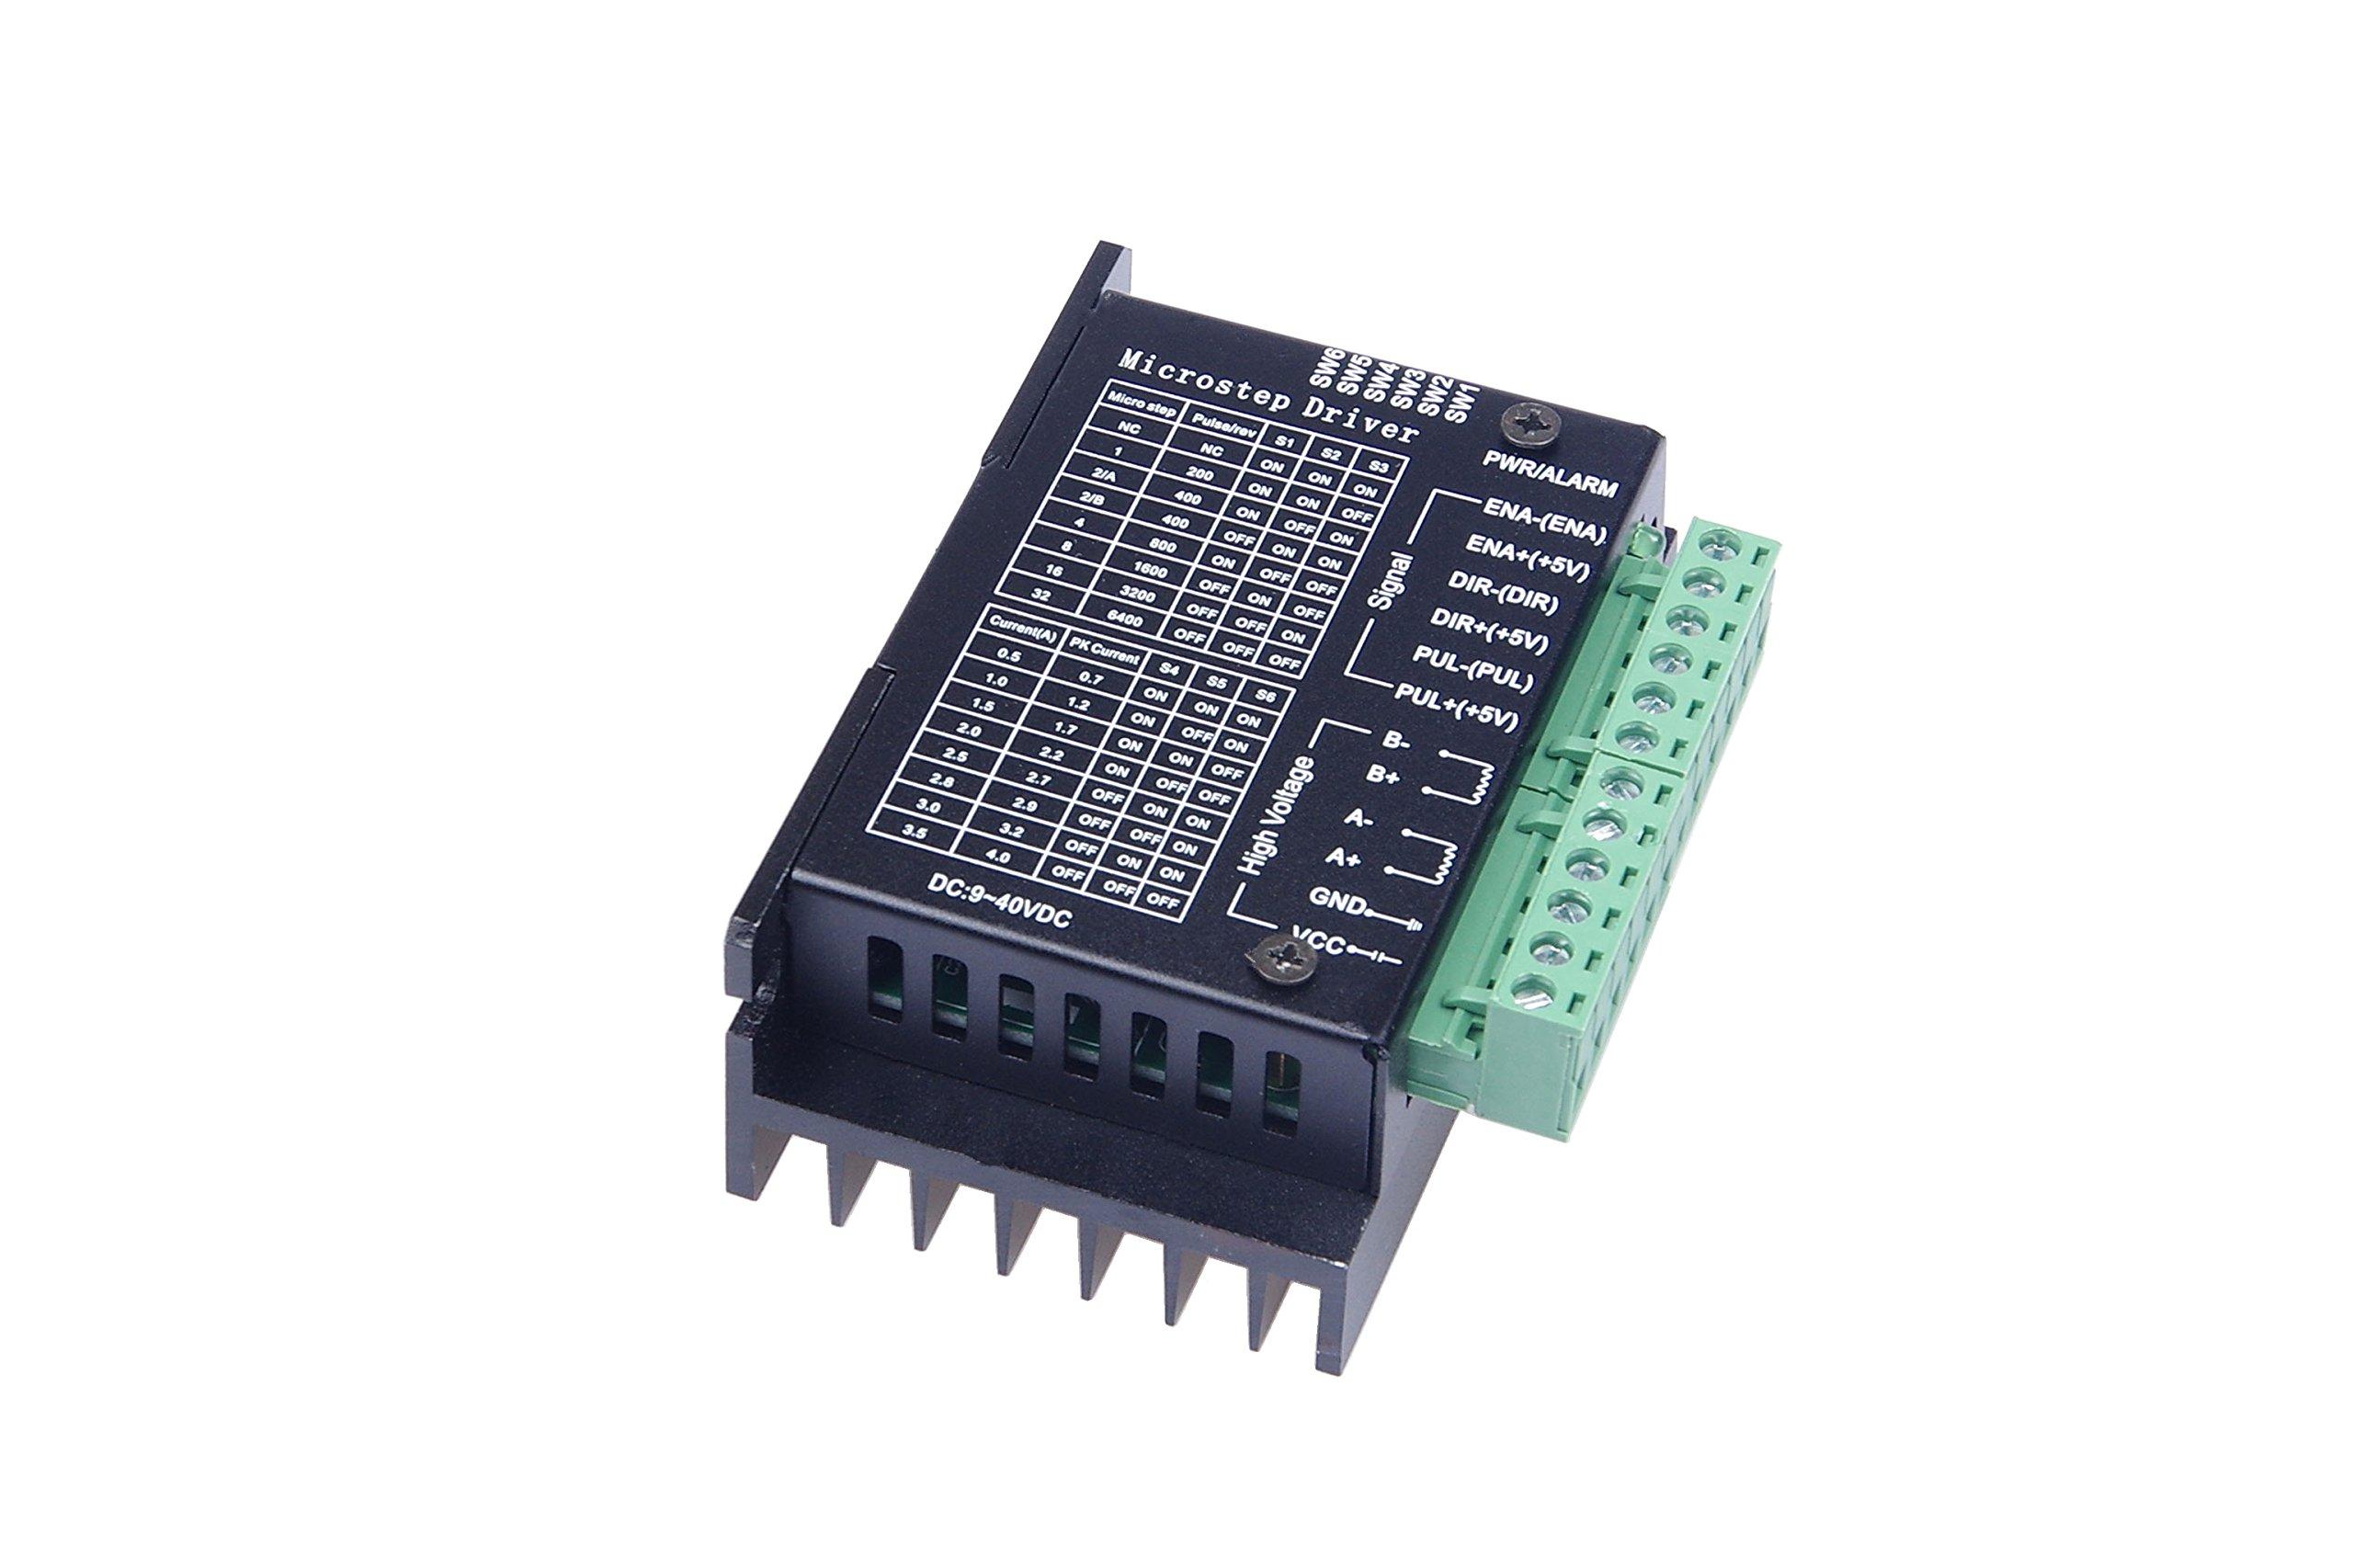 Lheng 4A 9-42V Stepper Motor Driver CNC Controller,32 Subdivision Upgrade tb6600 for 2 or 4 Phase of Stepper Motor 42 86 Random Pattern 57